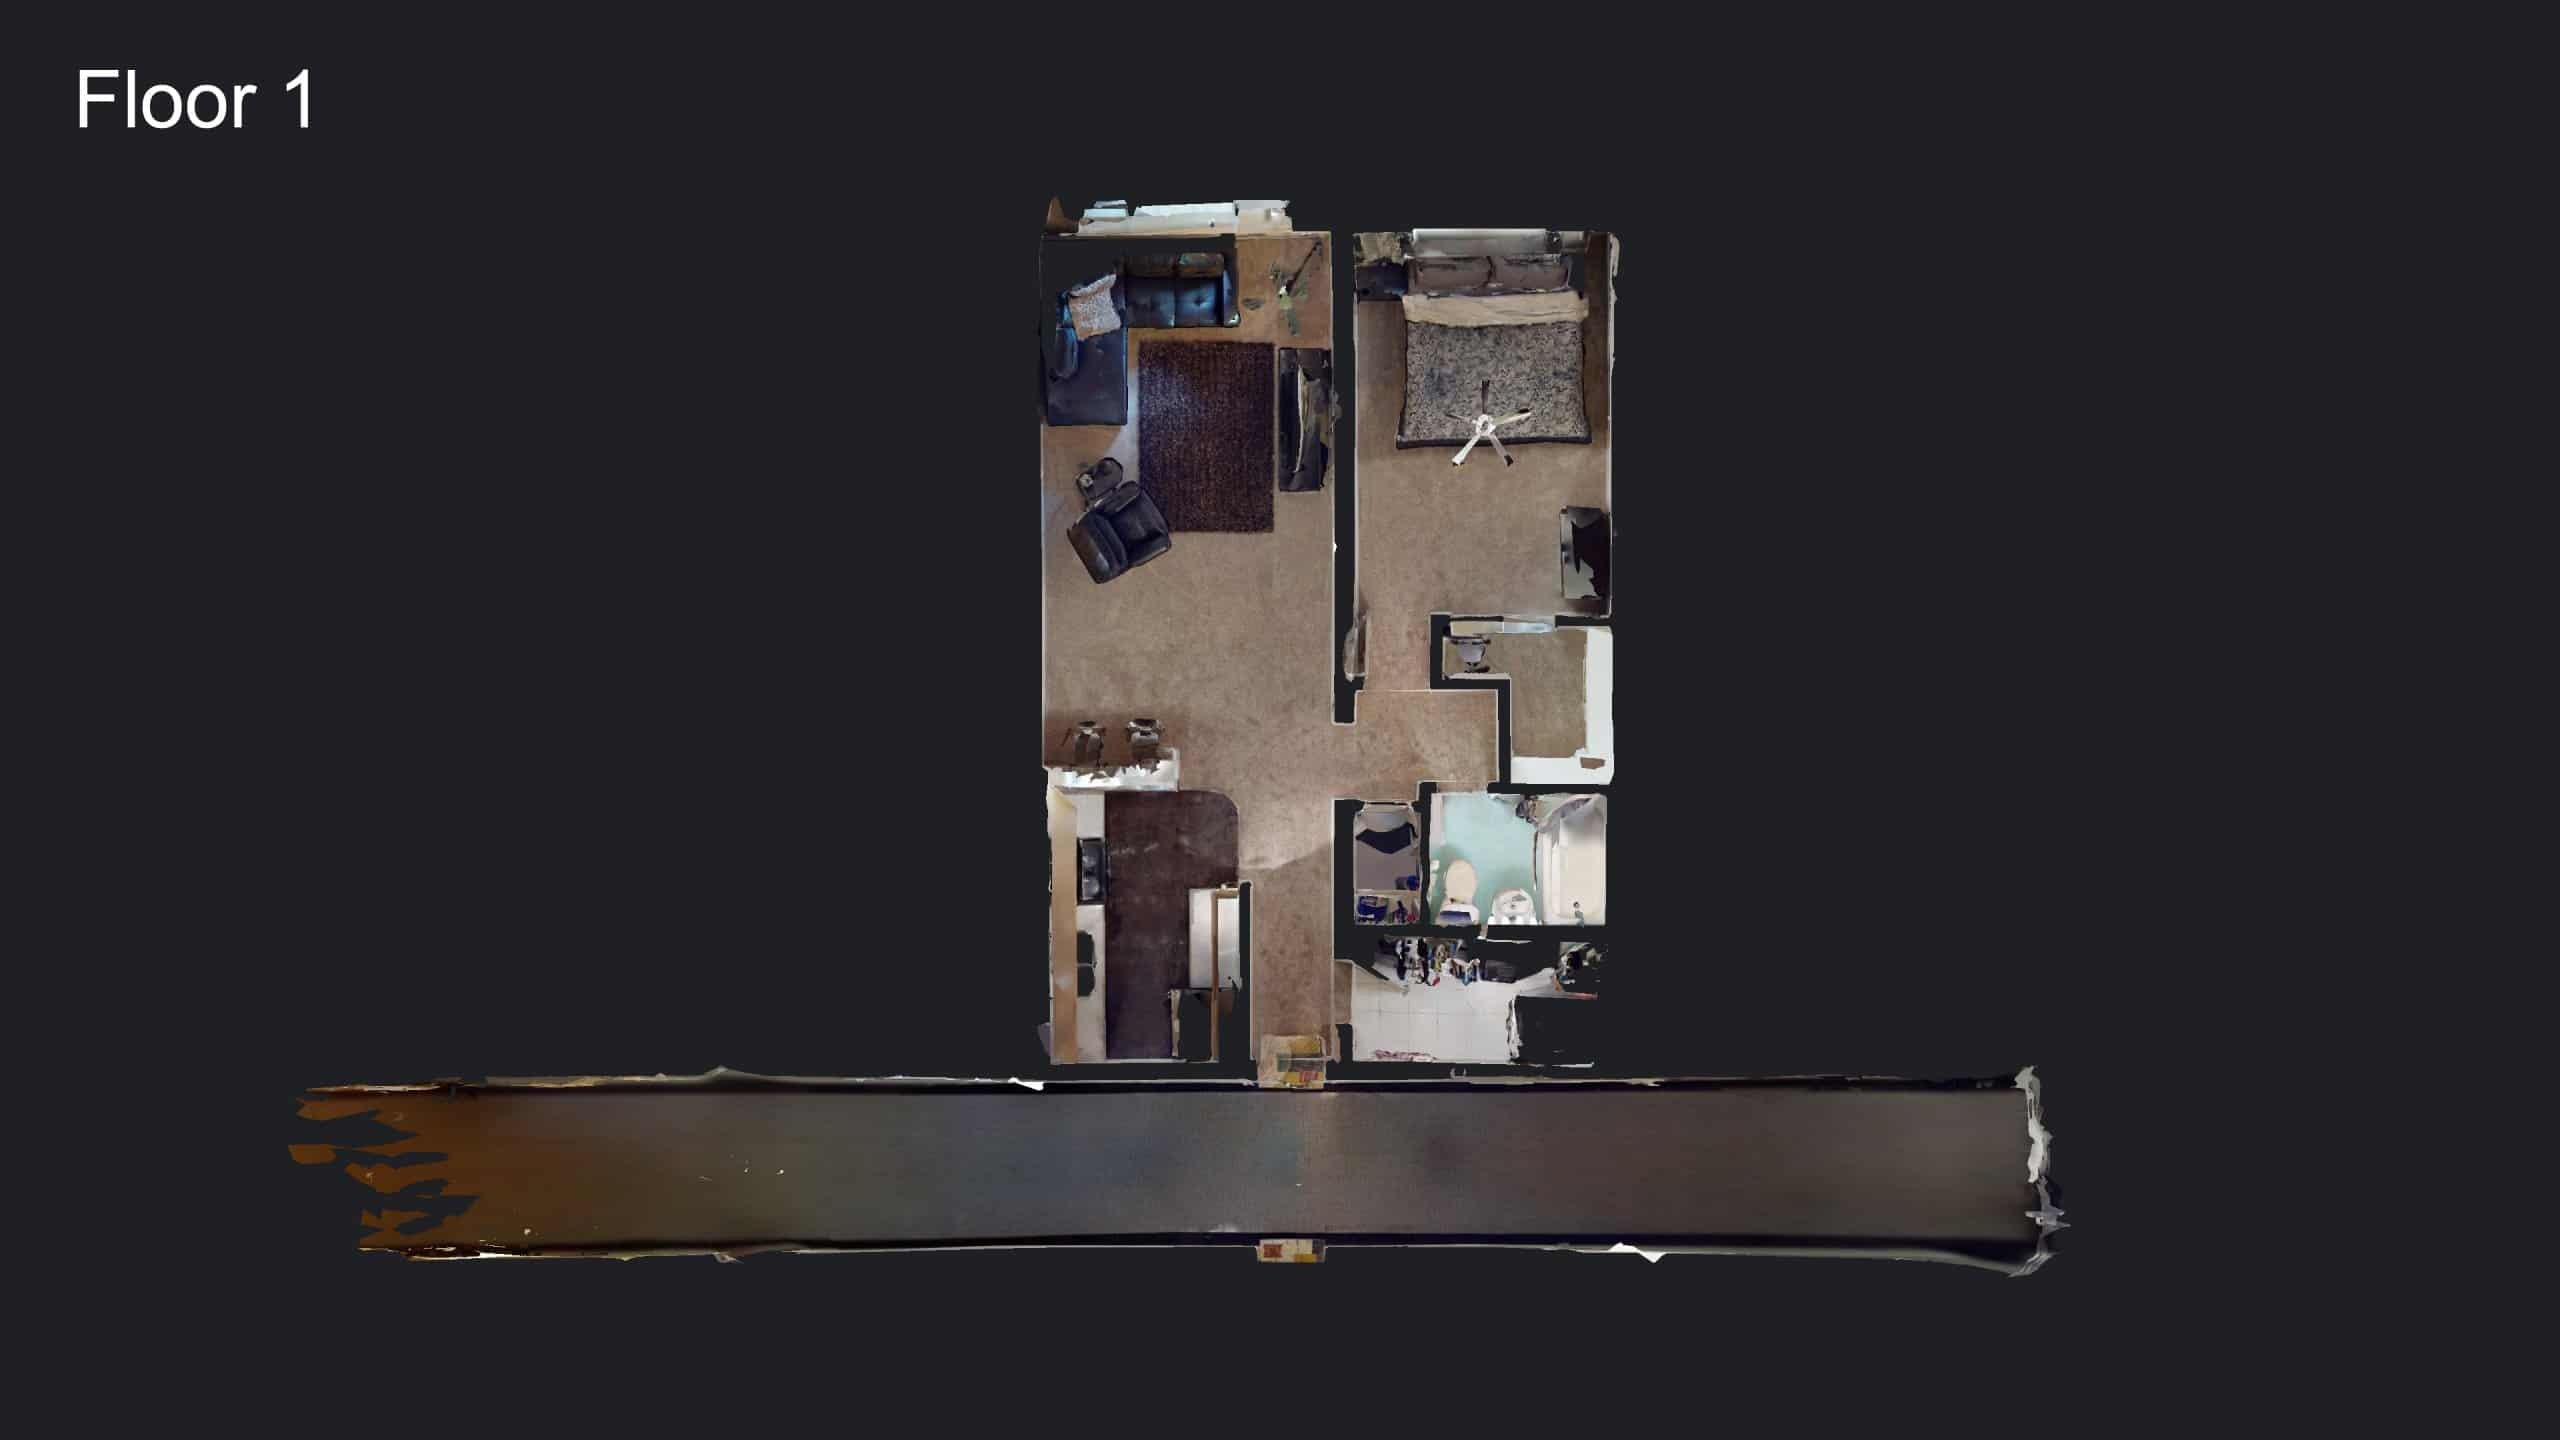 Congress-Park-Condo-3D-Floor-Plan